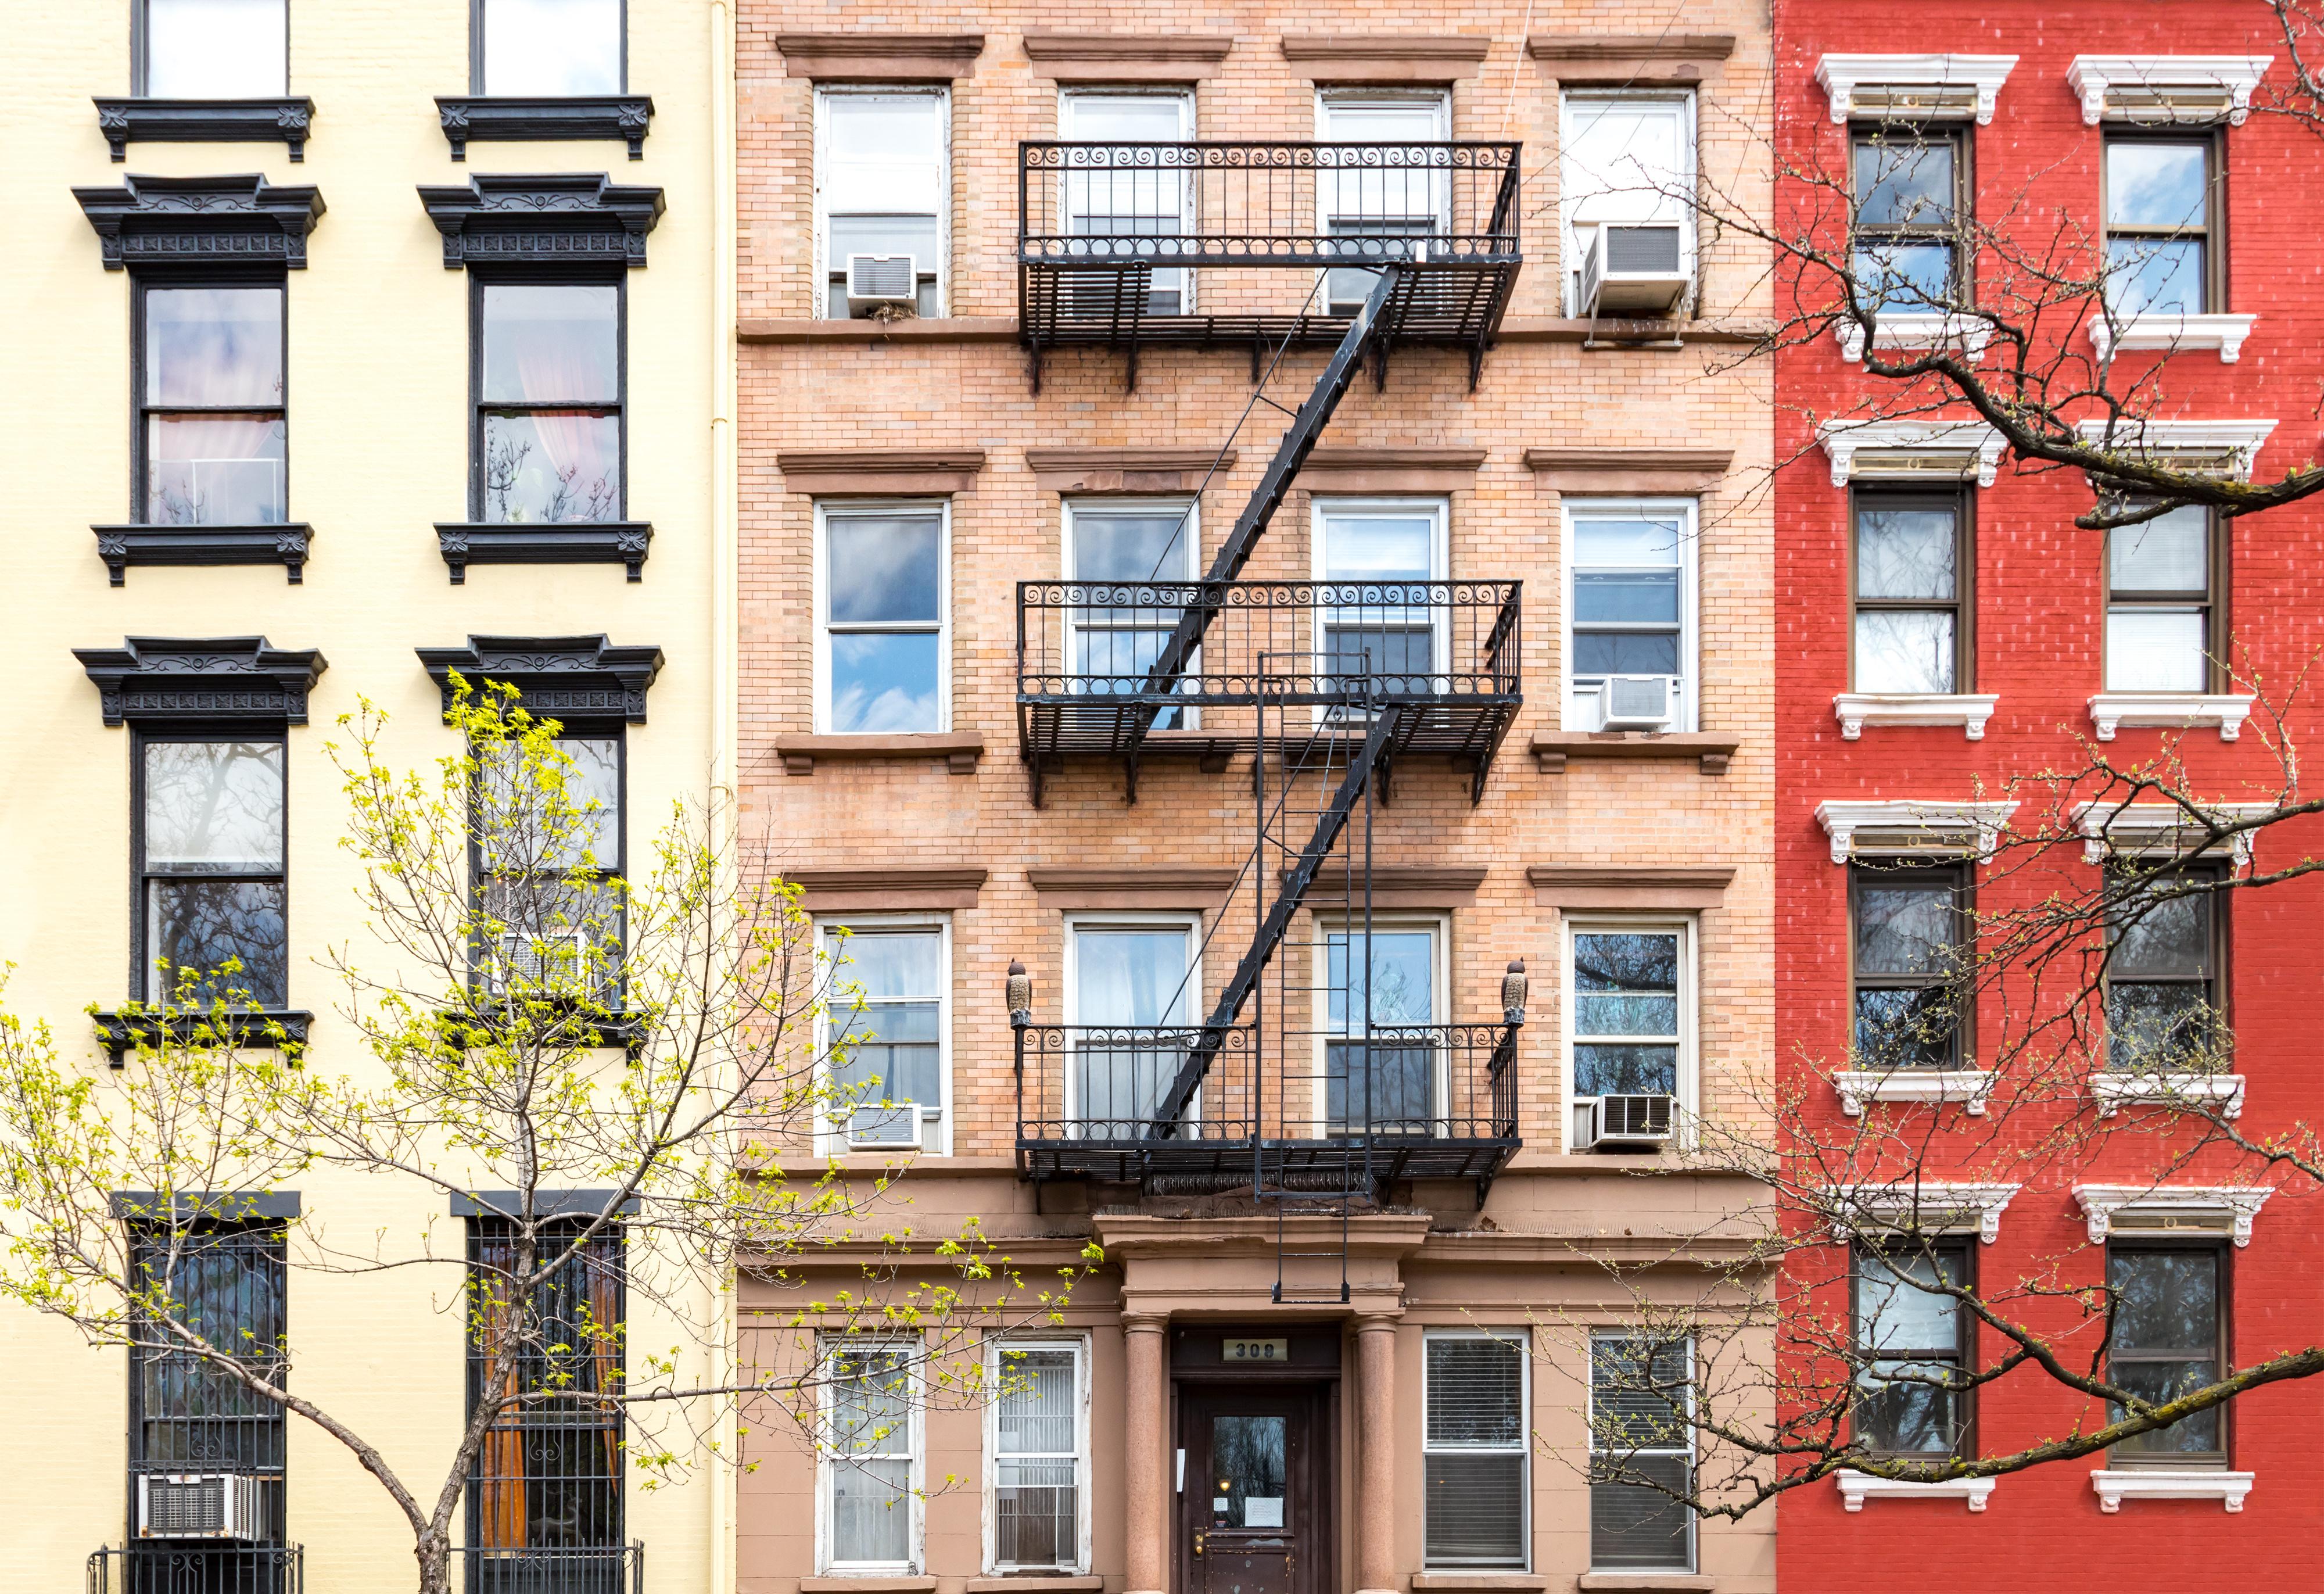 rent control debate economy landlords renters new york apartment buildings